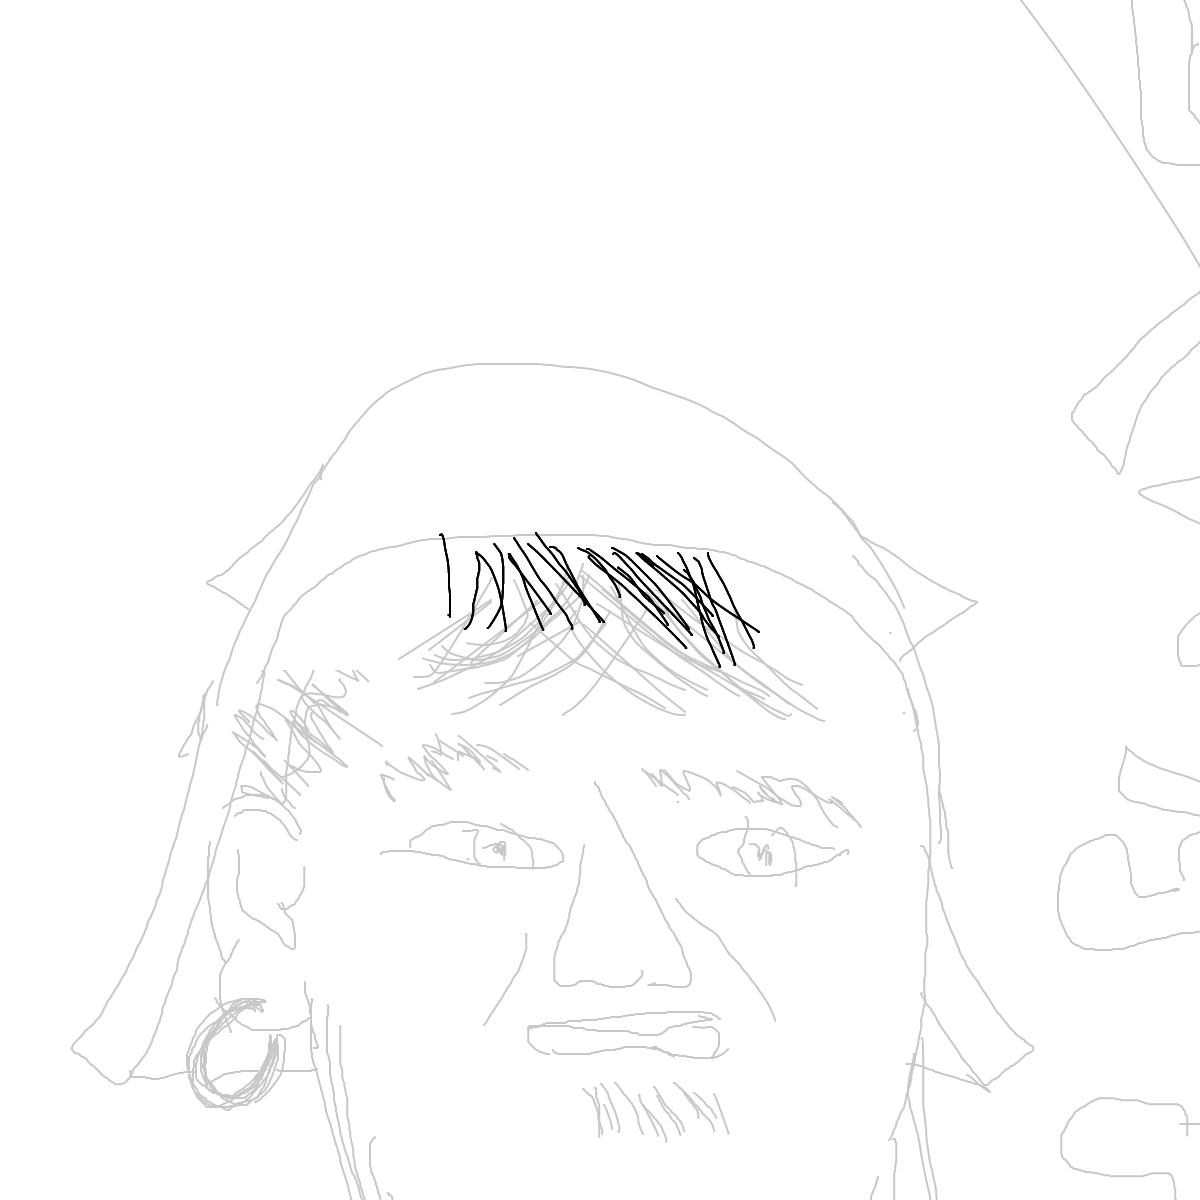 BAAAM drawing#23224 lat:47.1971931457519500lng: 104.8645019531250000